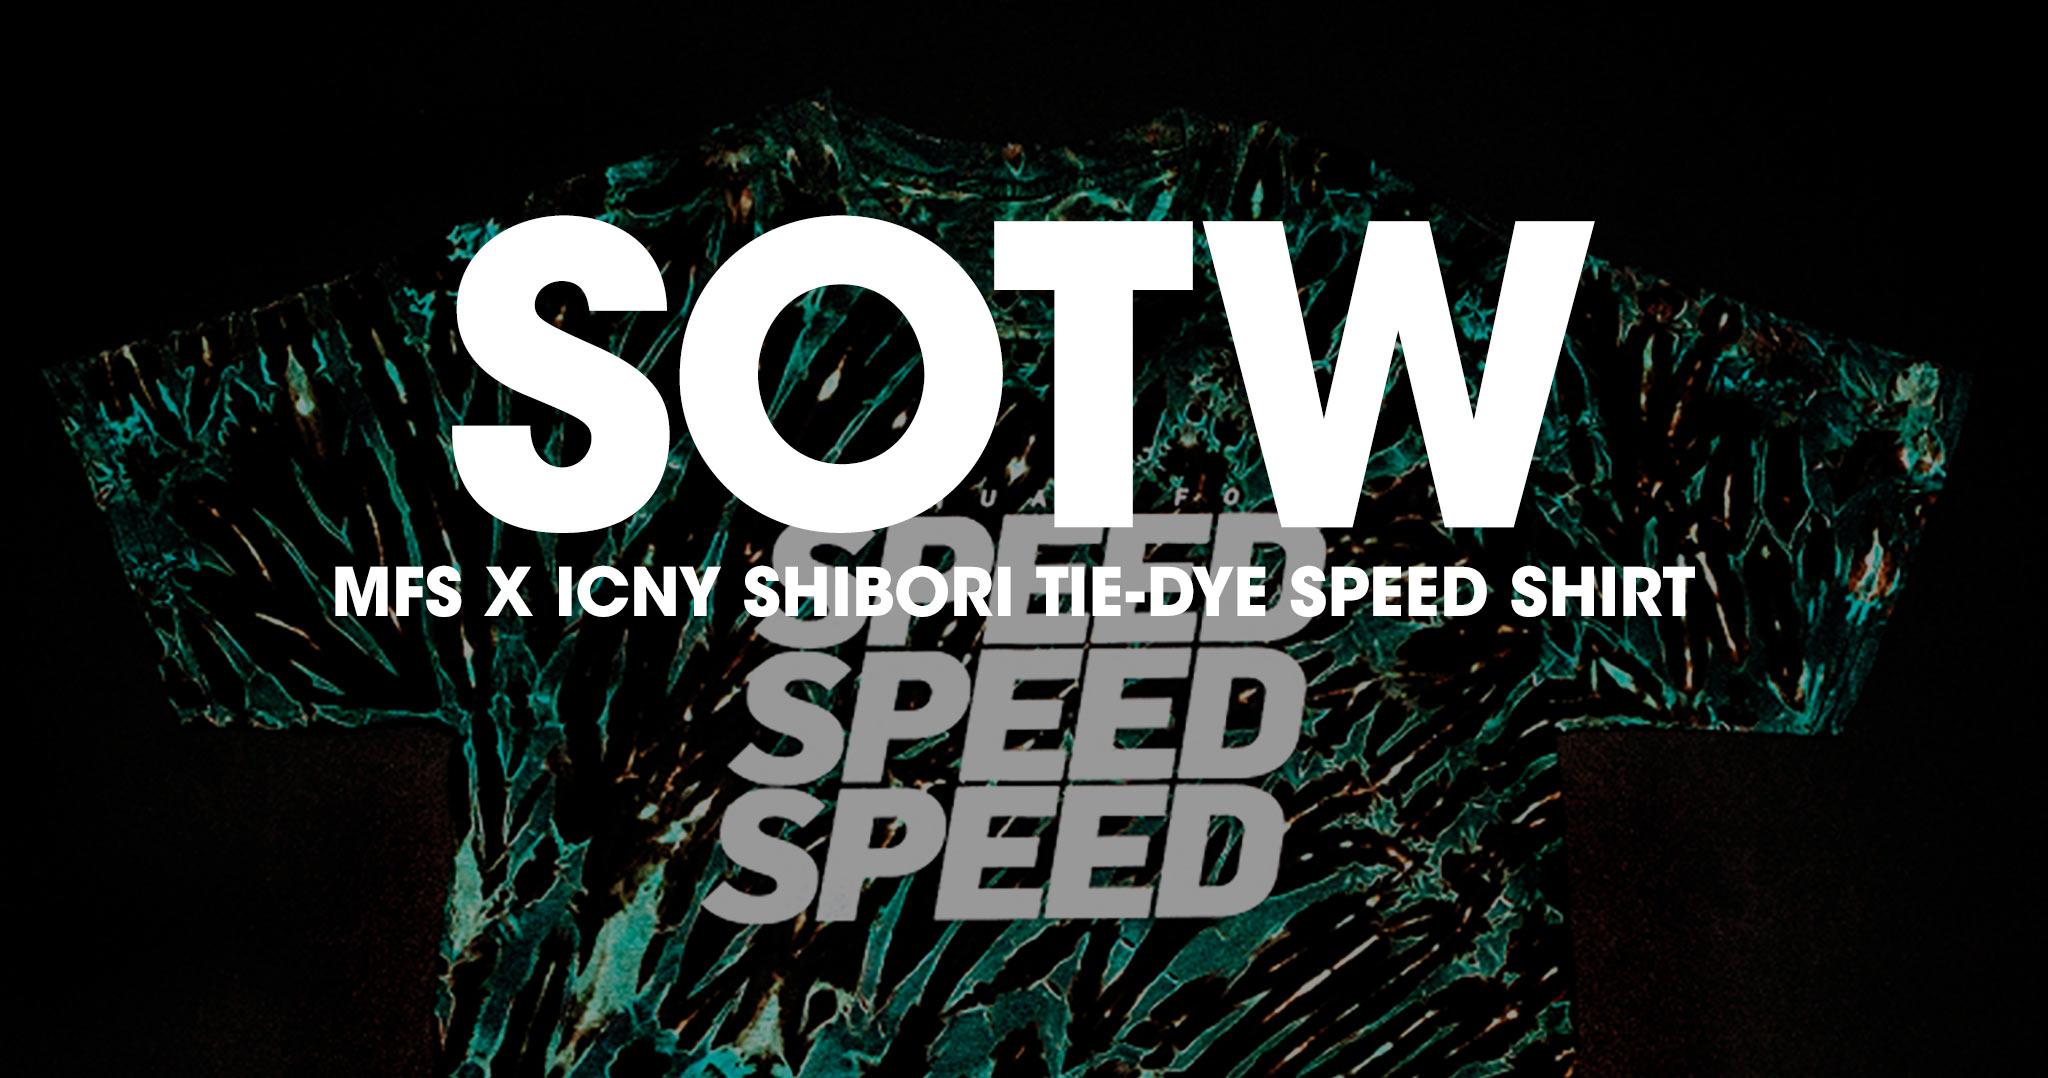 Shirt Of The Week: Manual For Speed X ICNY Shibori Tie-Dye SPEED Tee and Lookbook